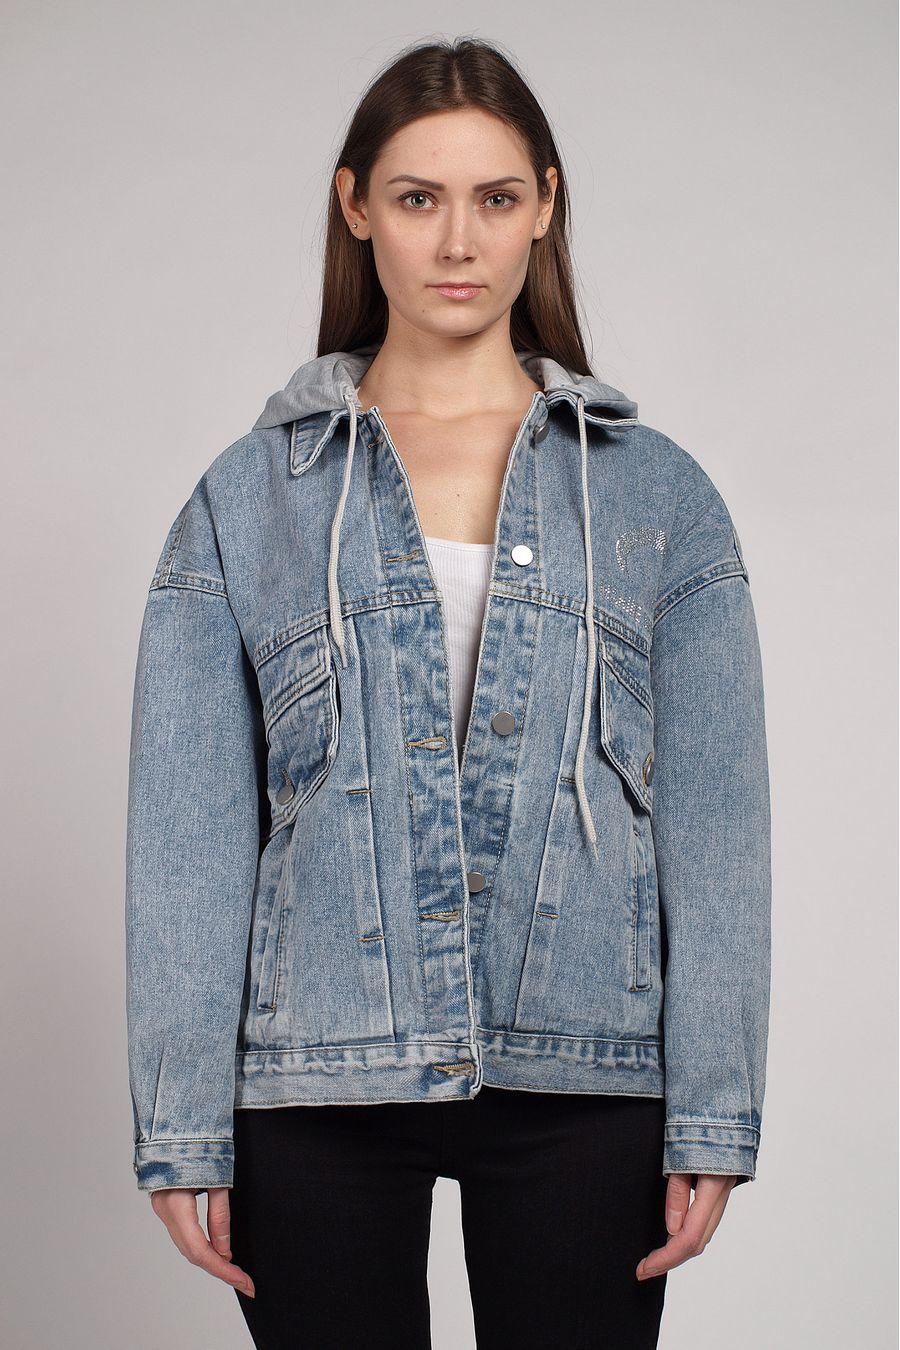 Жакет женский (джинсовка) LRZBS 2058 - фото 1